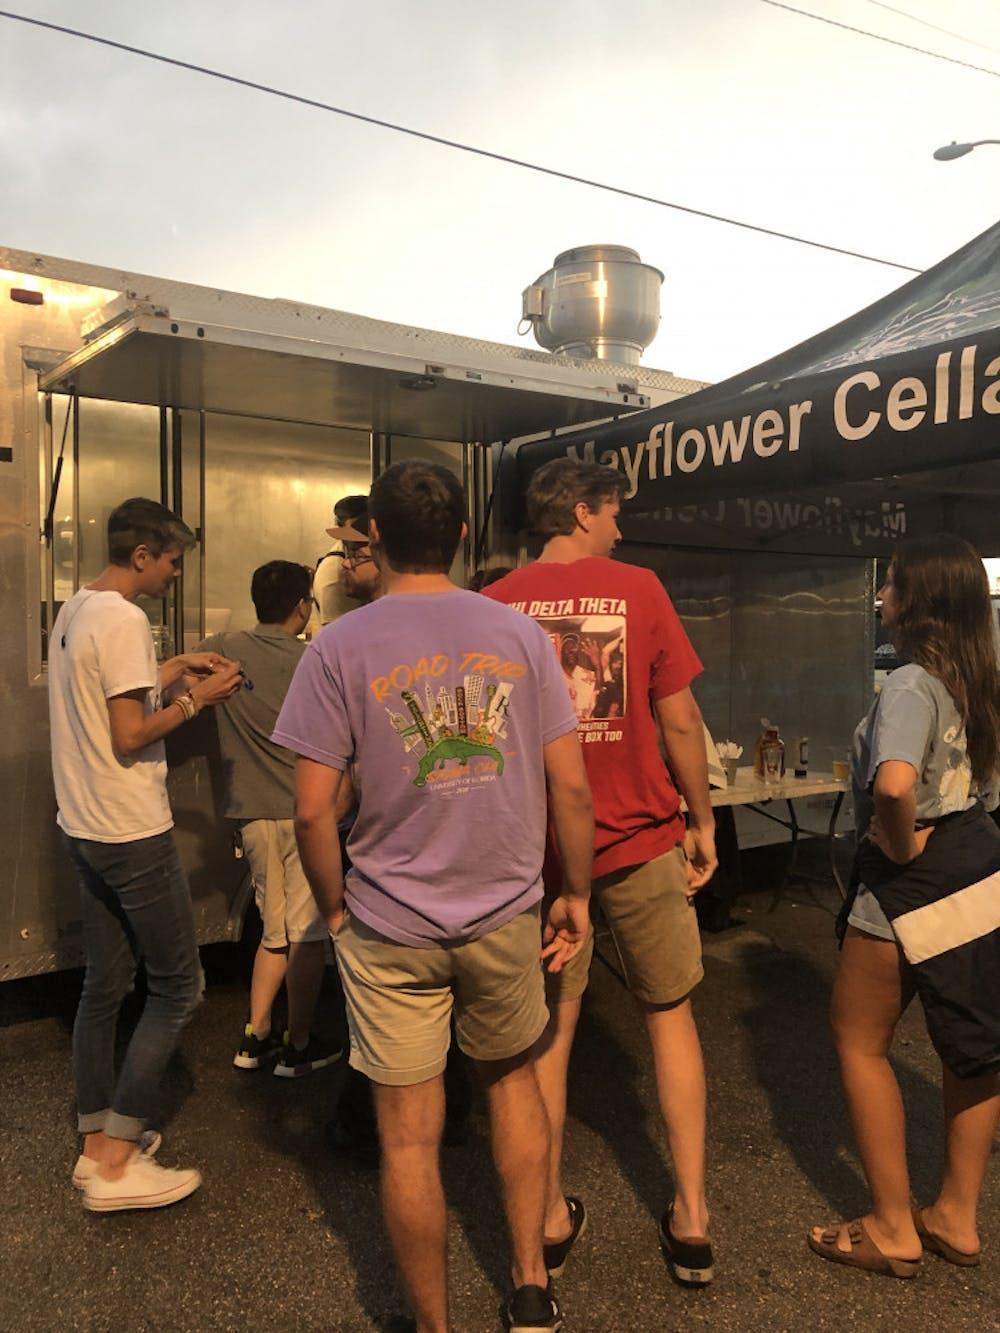 <p><span>Mayflower Cellars restaurant frequently posts food trucks throughout Gainesville.</span></p>